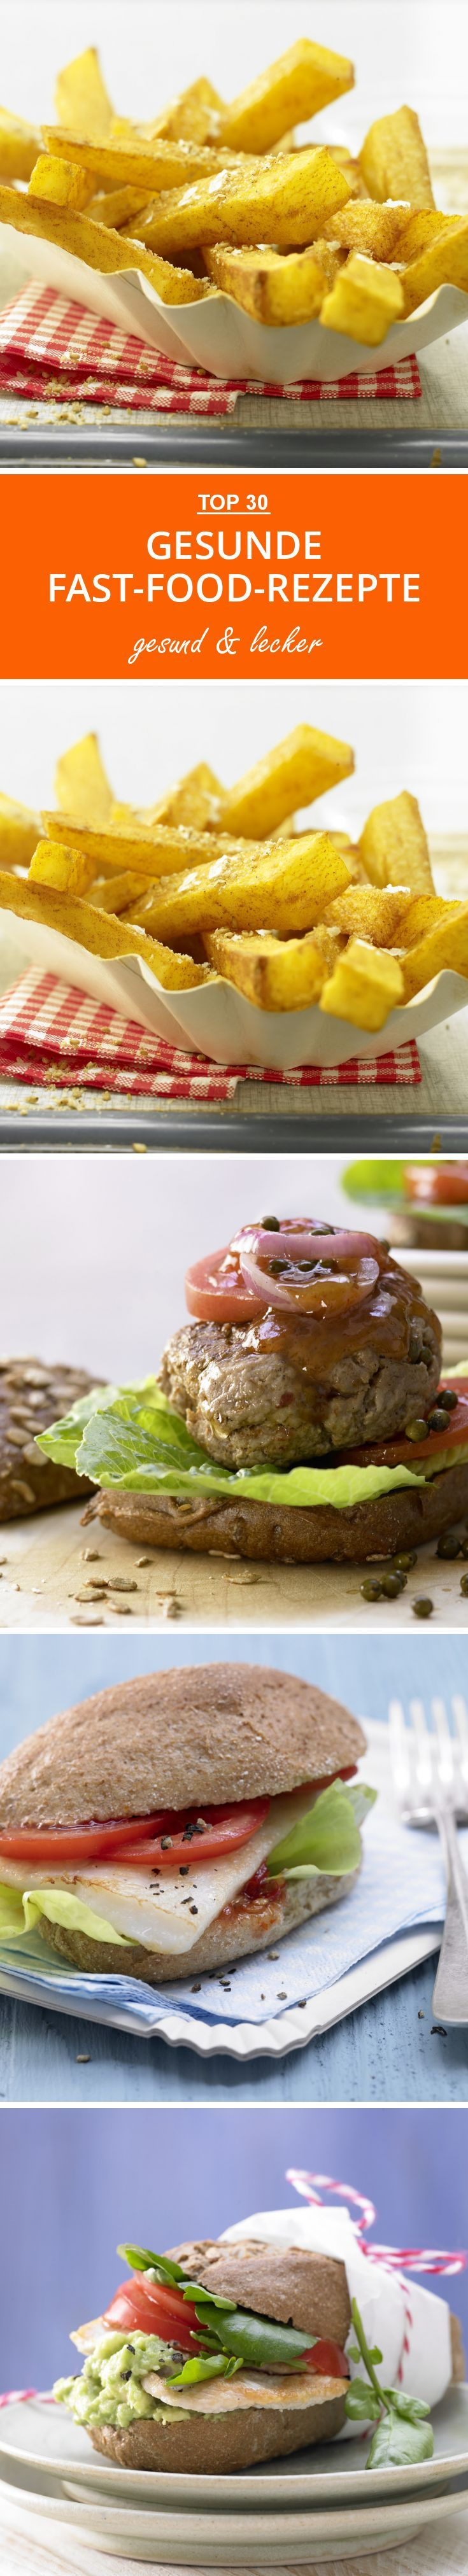 Gesunde Fast-Food-Rezepte   eatsmarter.de